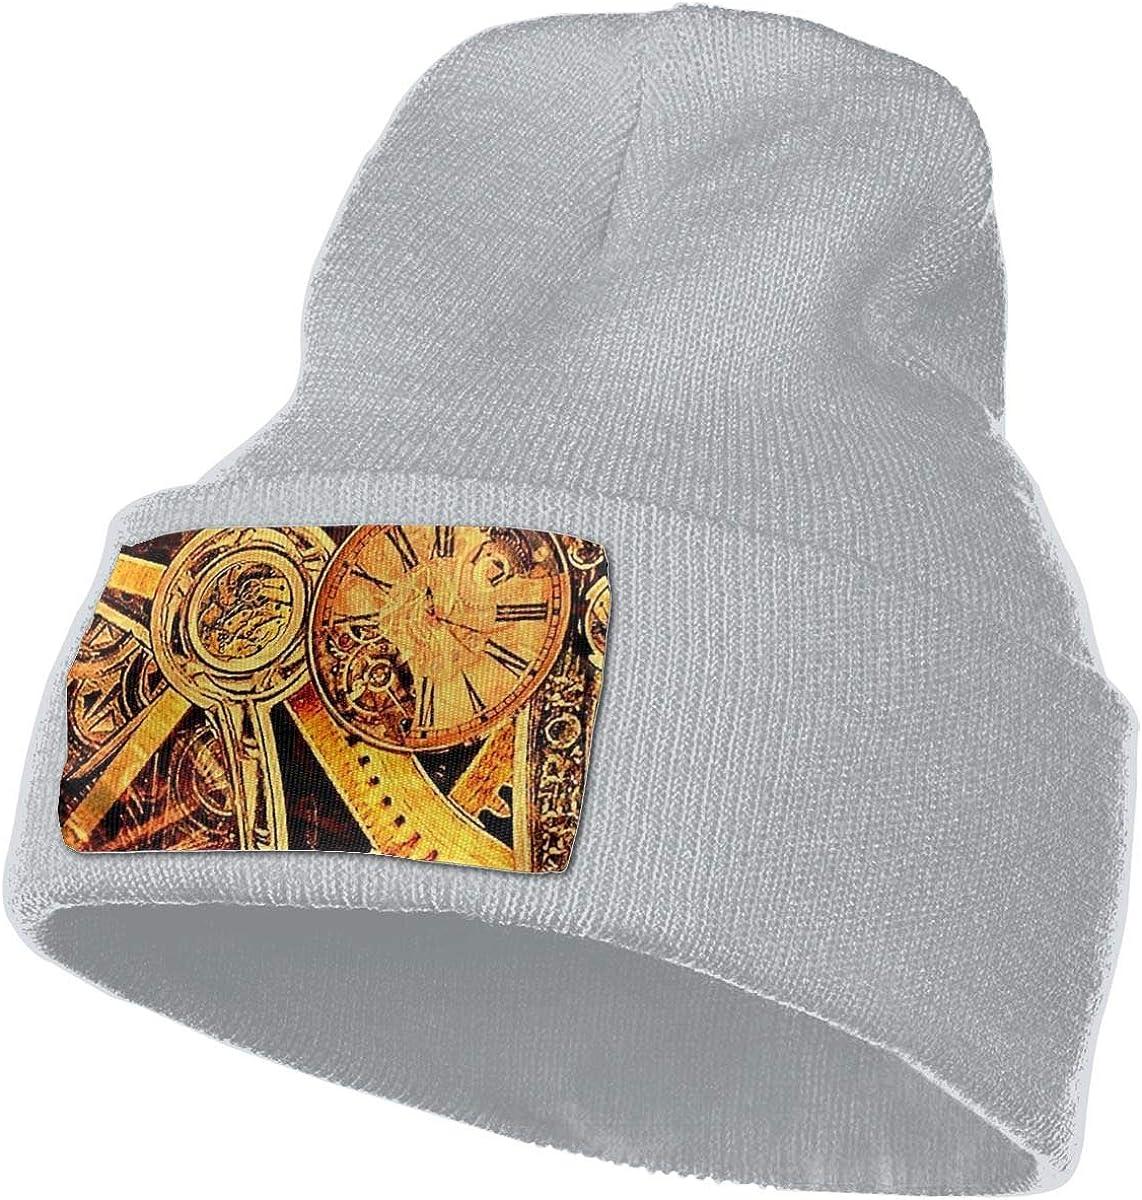 Mens and Womens 100/% Acrylic Knit Hat Cap Gear Mechanism Soft Skull Beanie